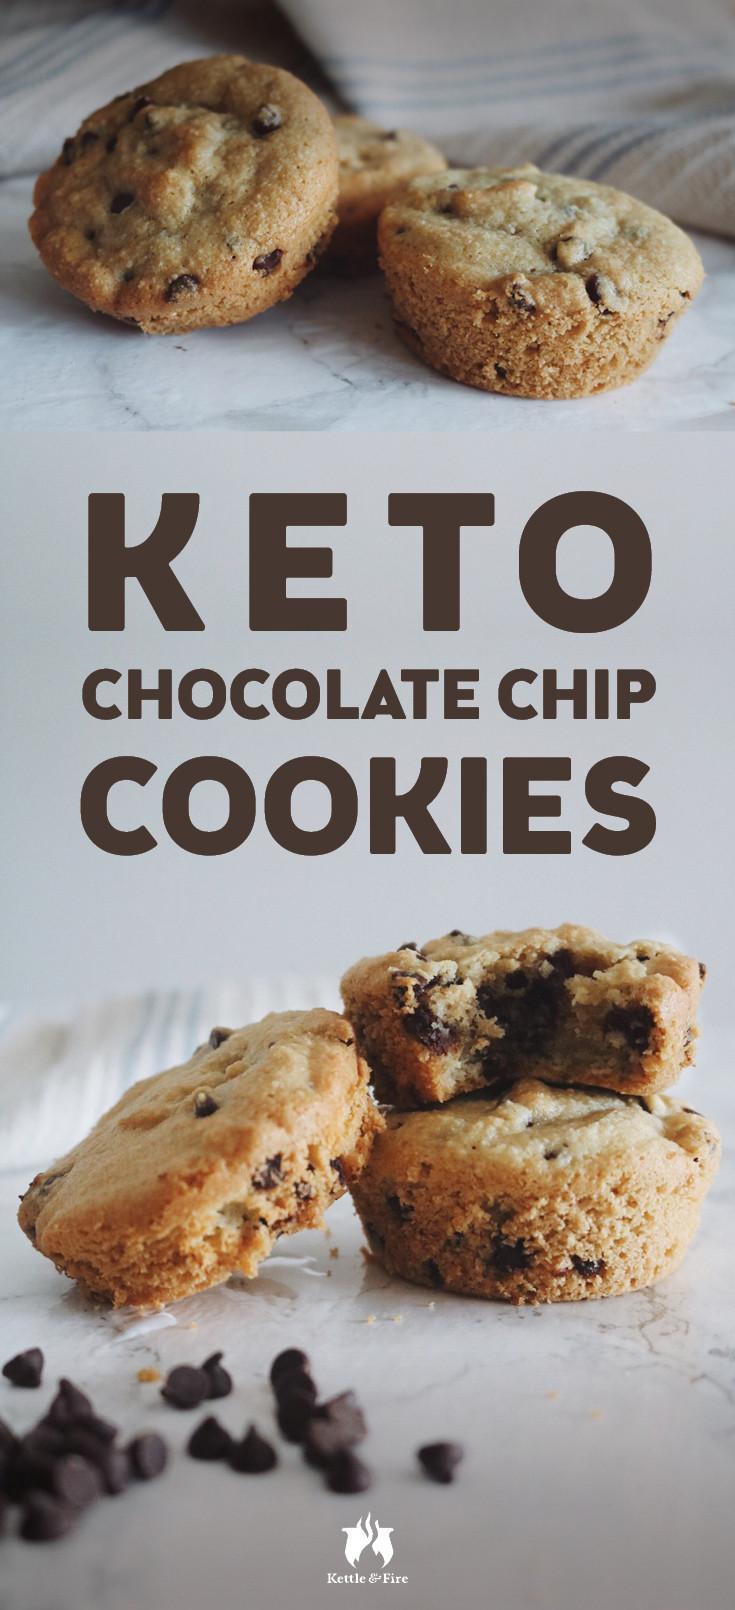 Keto Chocolate Chip Cookies  Keto Chocolate Chip Cookies